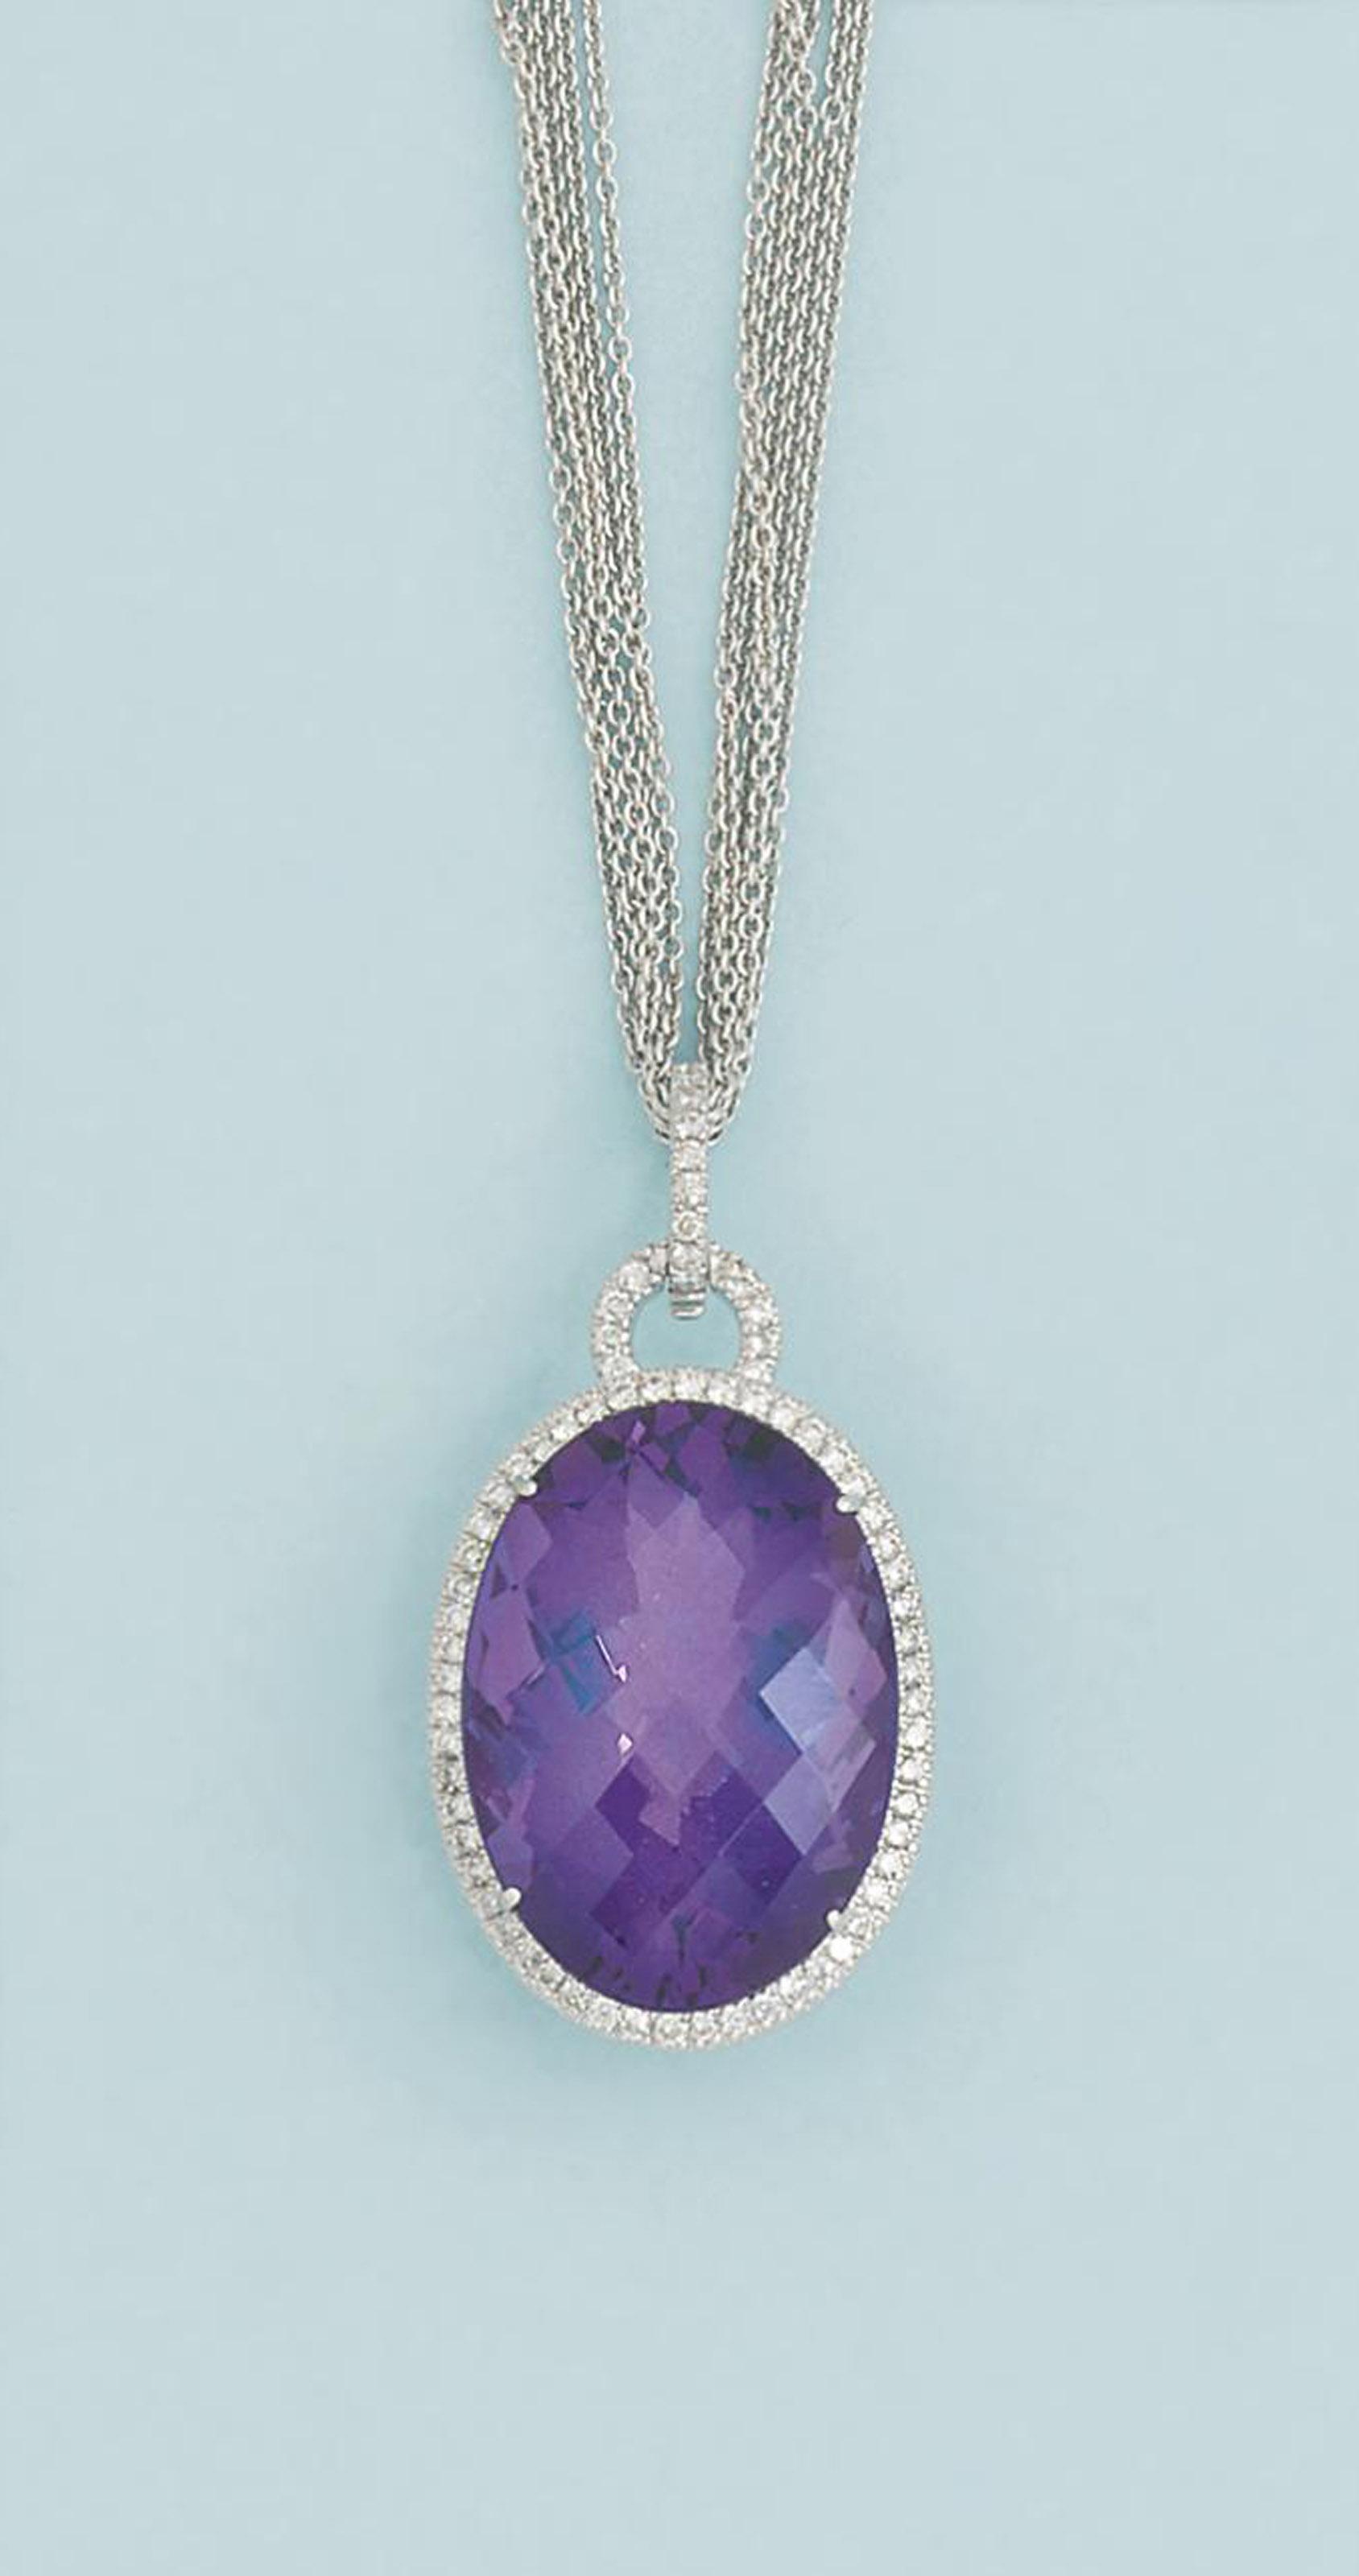 An amethyst and diamond pendan